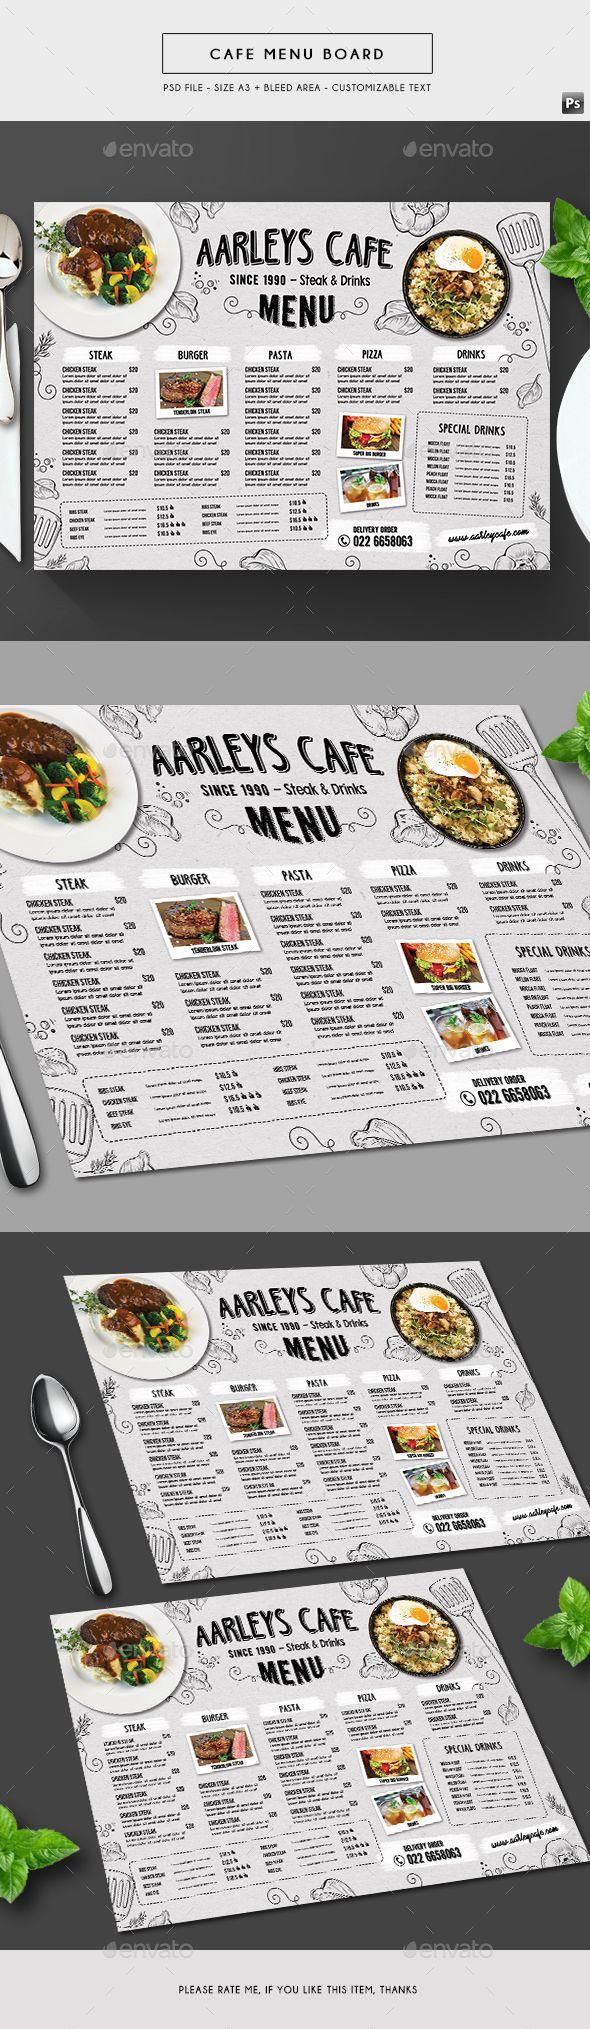 Doodle Cafe Menu Board Pinterest Cafe Menu Boards Cafe Menu And - Menu board design templates